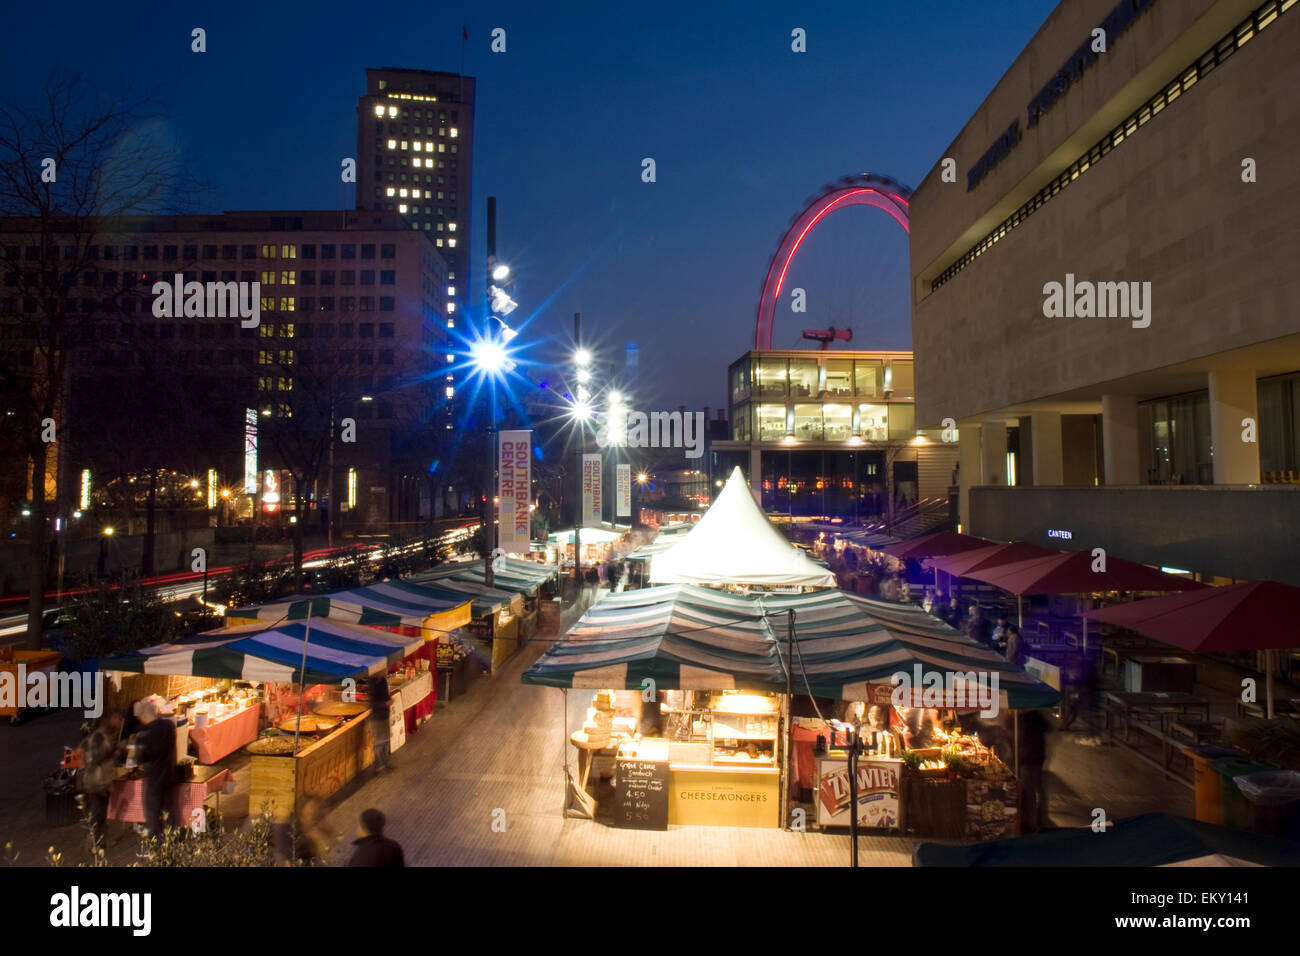 Royal Festival Hall food market, South Bank, London, UK - Stock Image